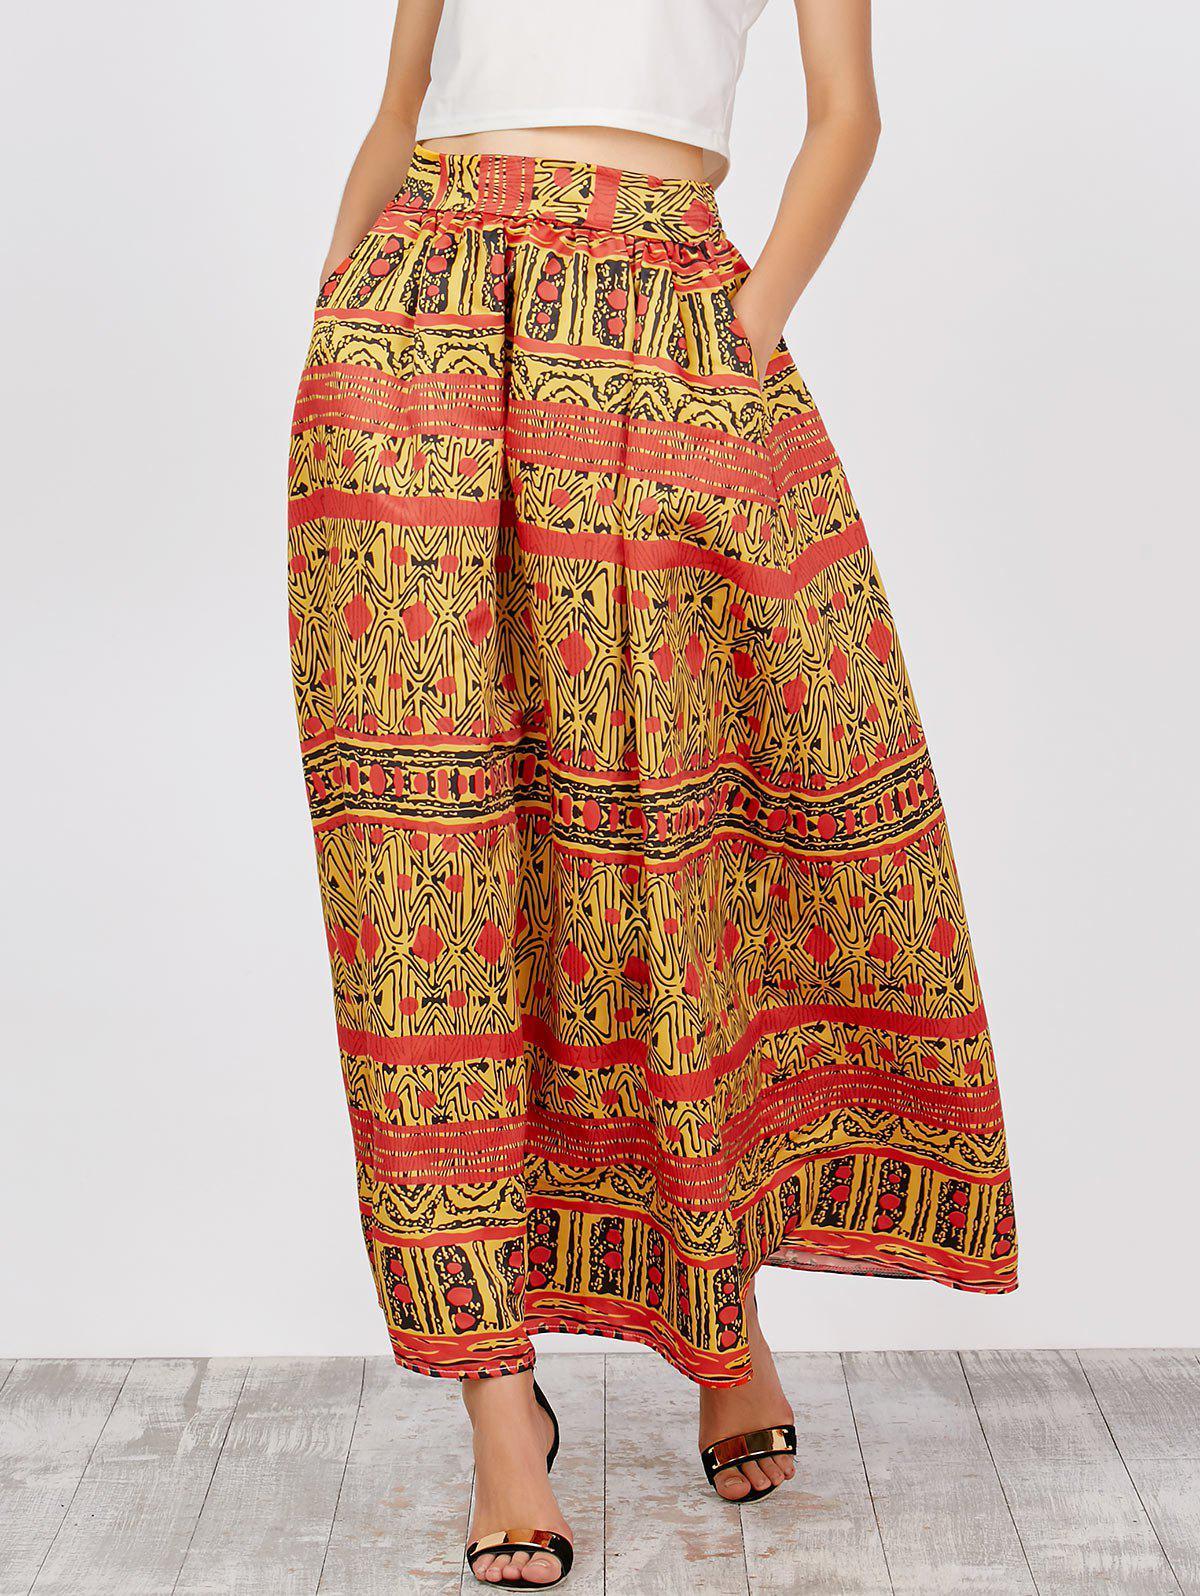 Haute taille imprimé africain maxi jupes